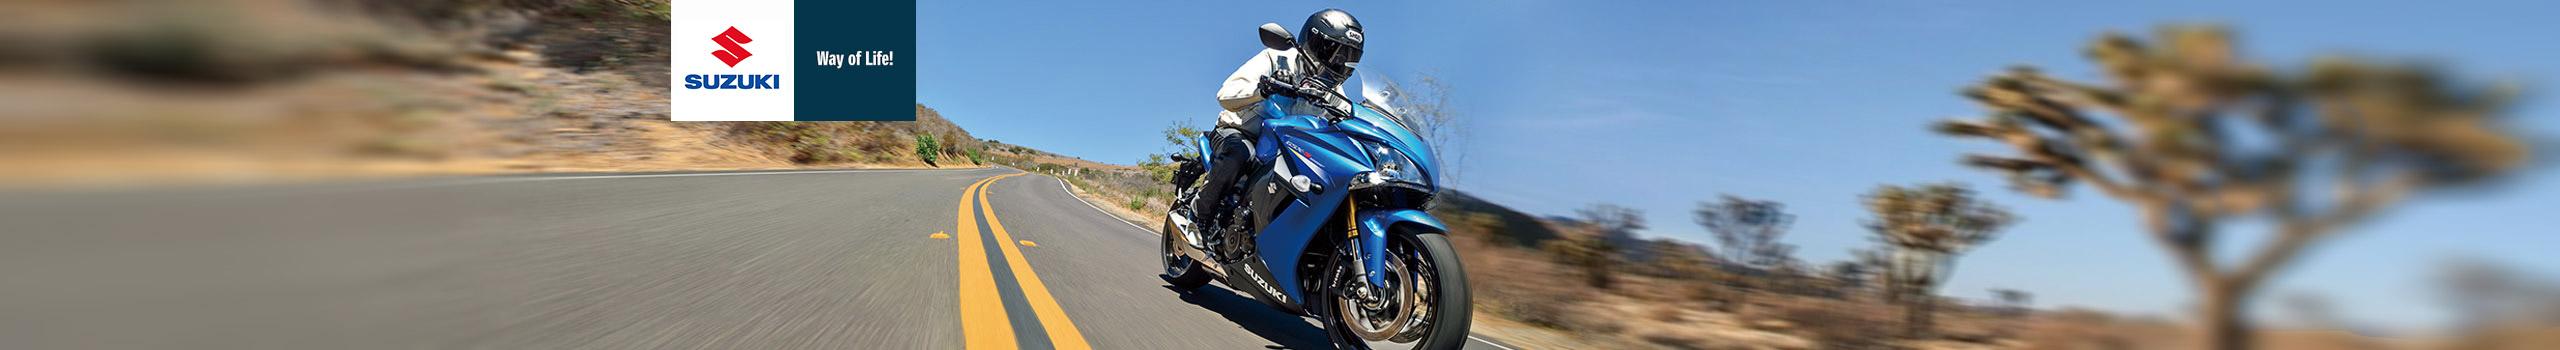 Suzuki motorcycles for sale | New and used Suzuki motorbikes | Auto ...